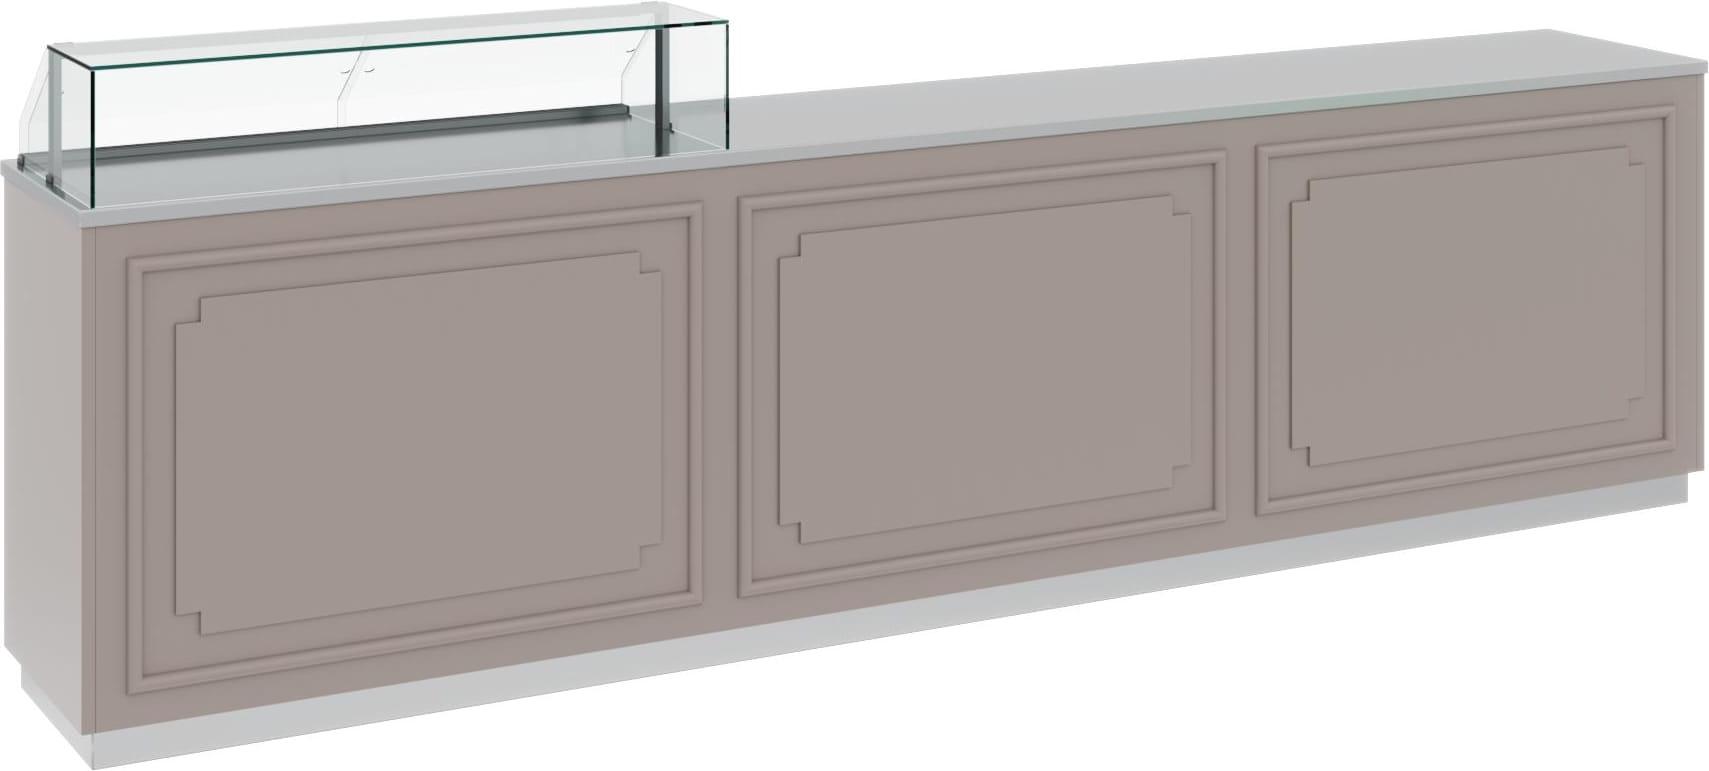 Нейтральная витрина CARBOMA AC40N 2.25-1 - 1